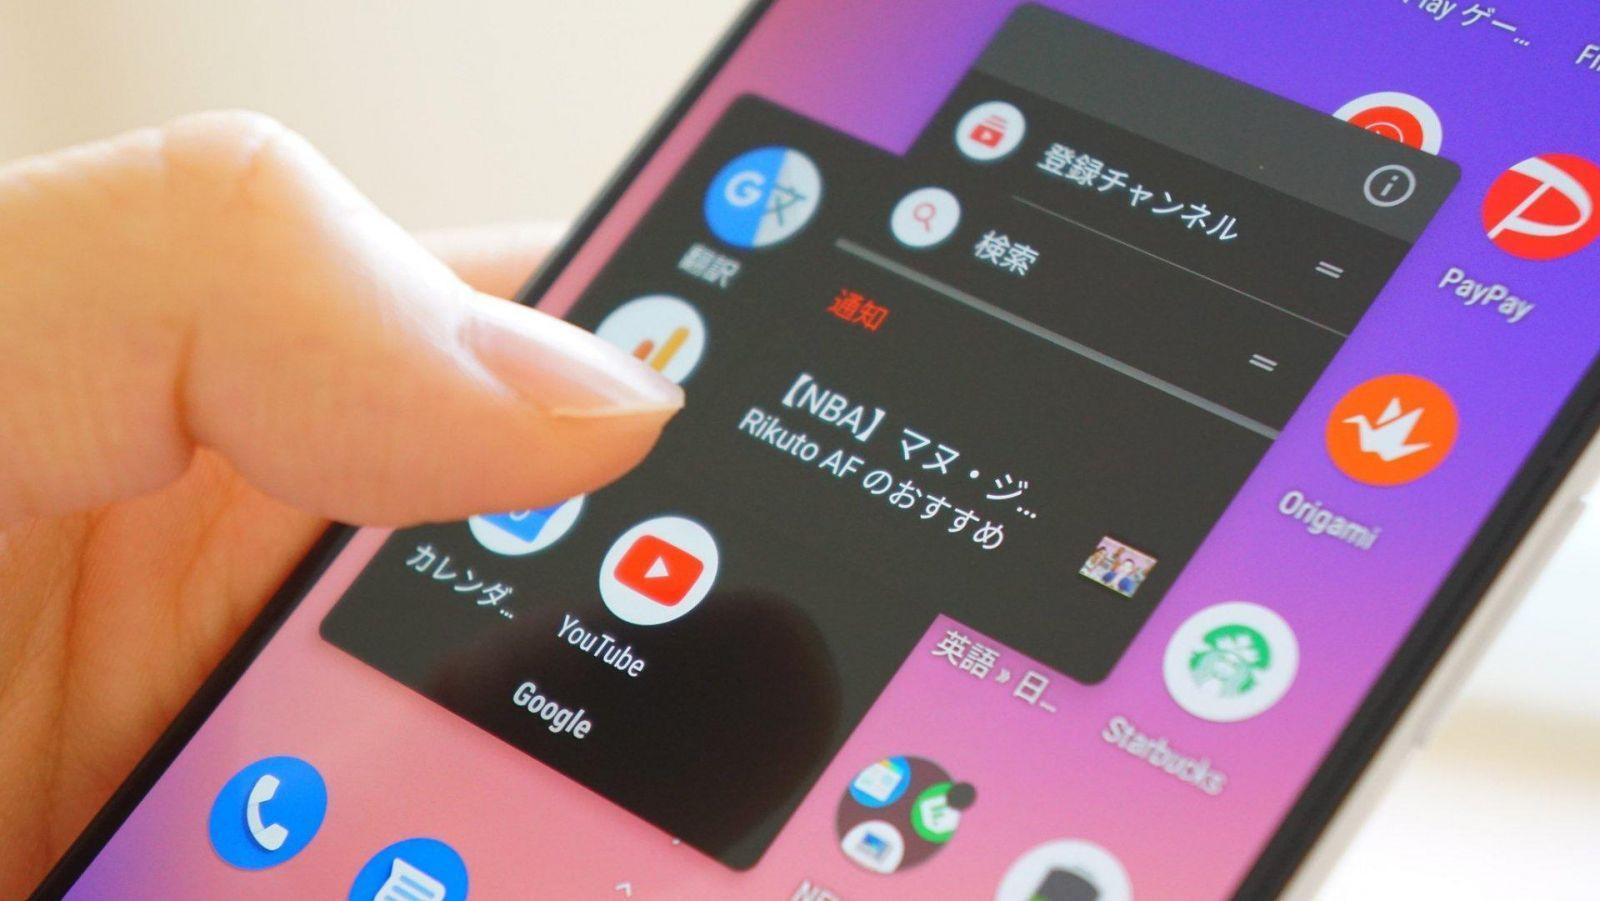 В Android Q будут глубокие нажатия Deep Press, аналог Apple 3D Touch (deep press android q ile ortaya cikacak)